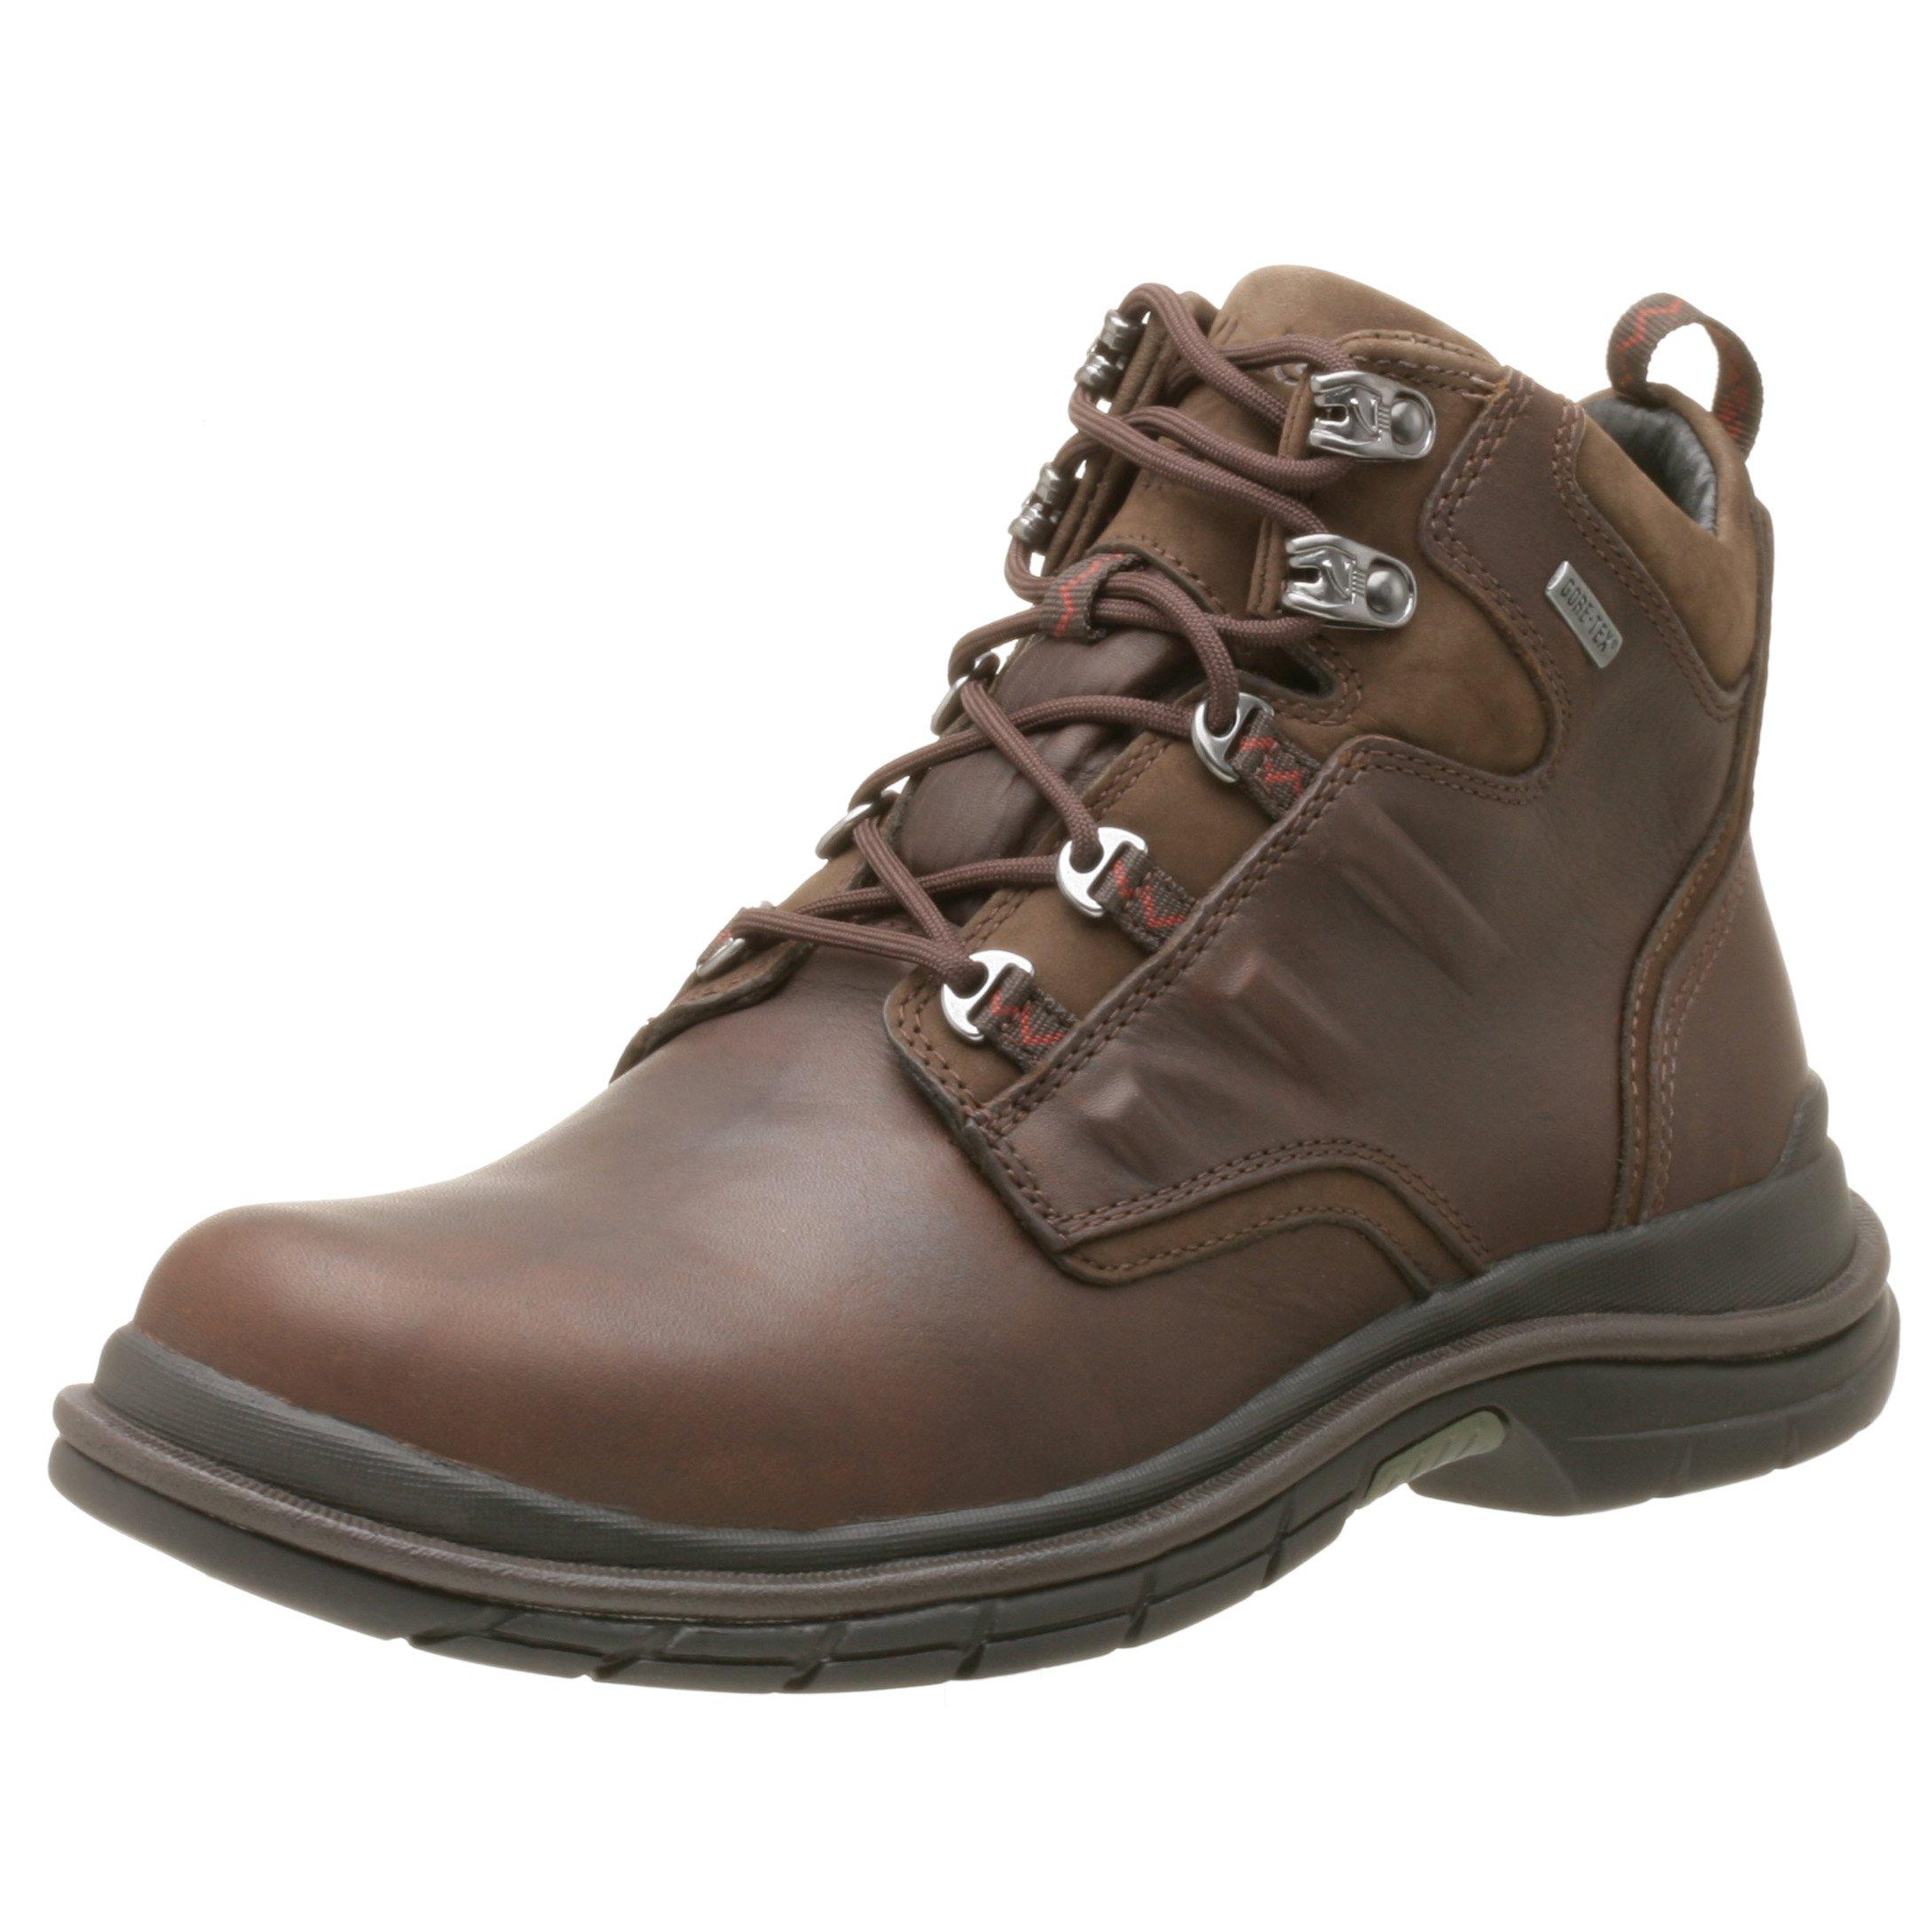 CLARKS Mens Gore Tex174 Boot Brown